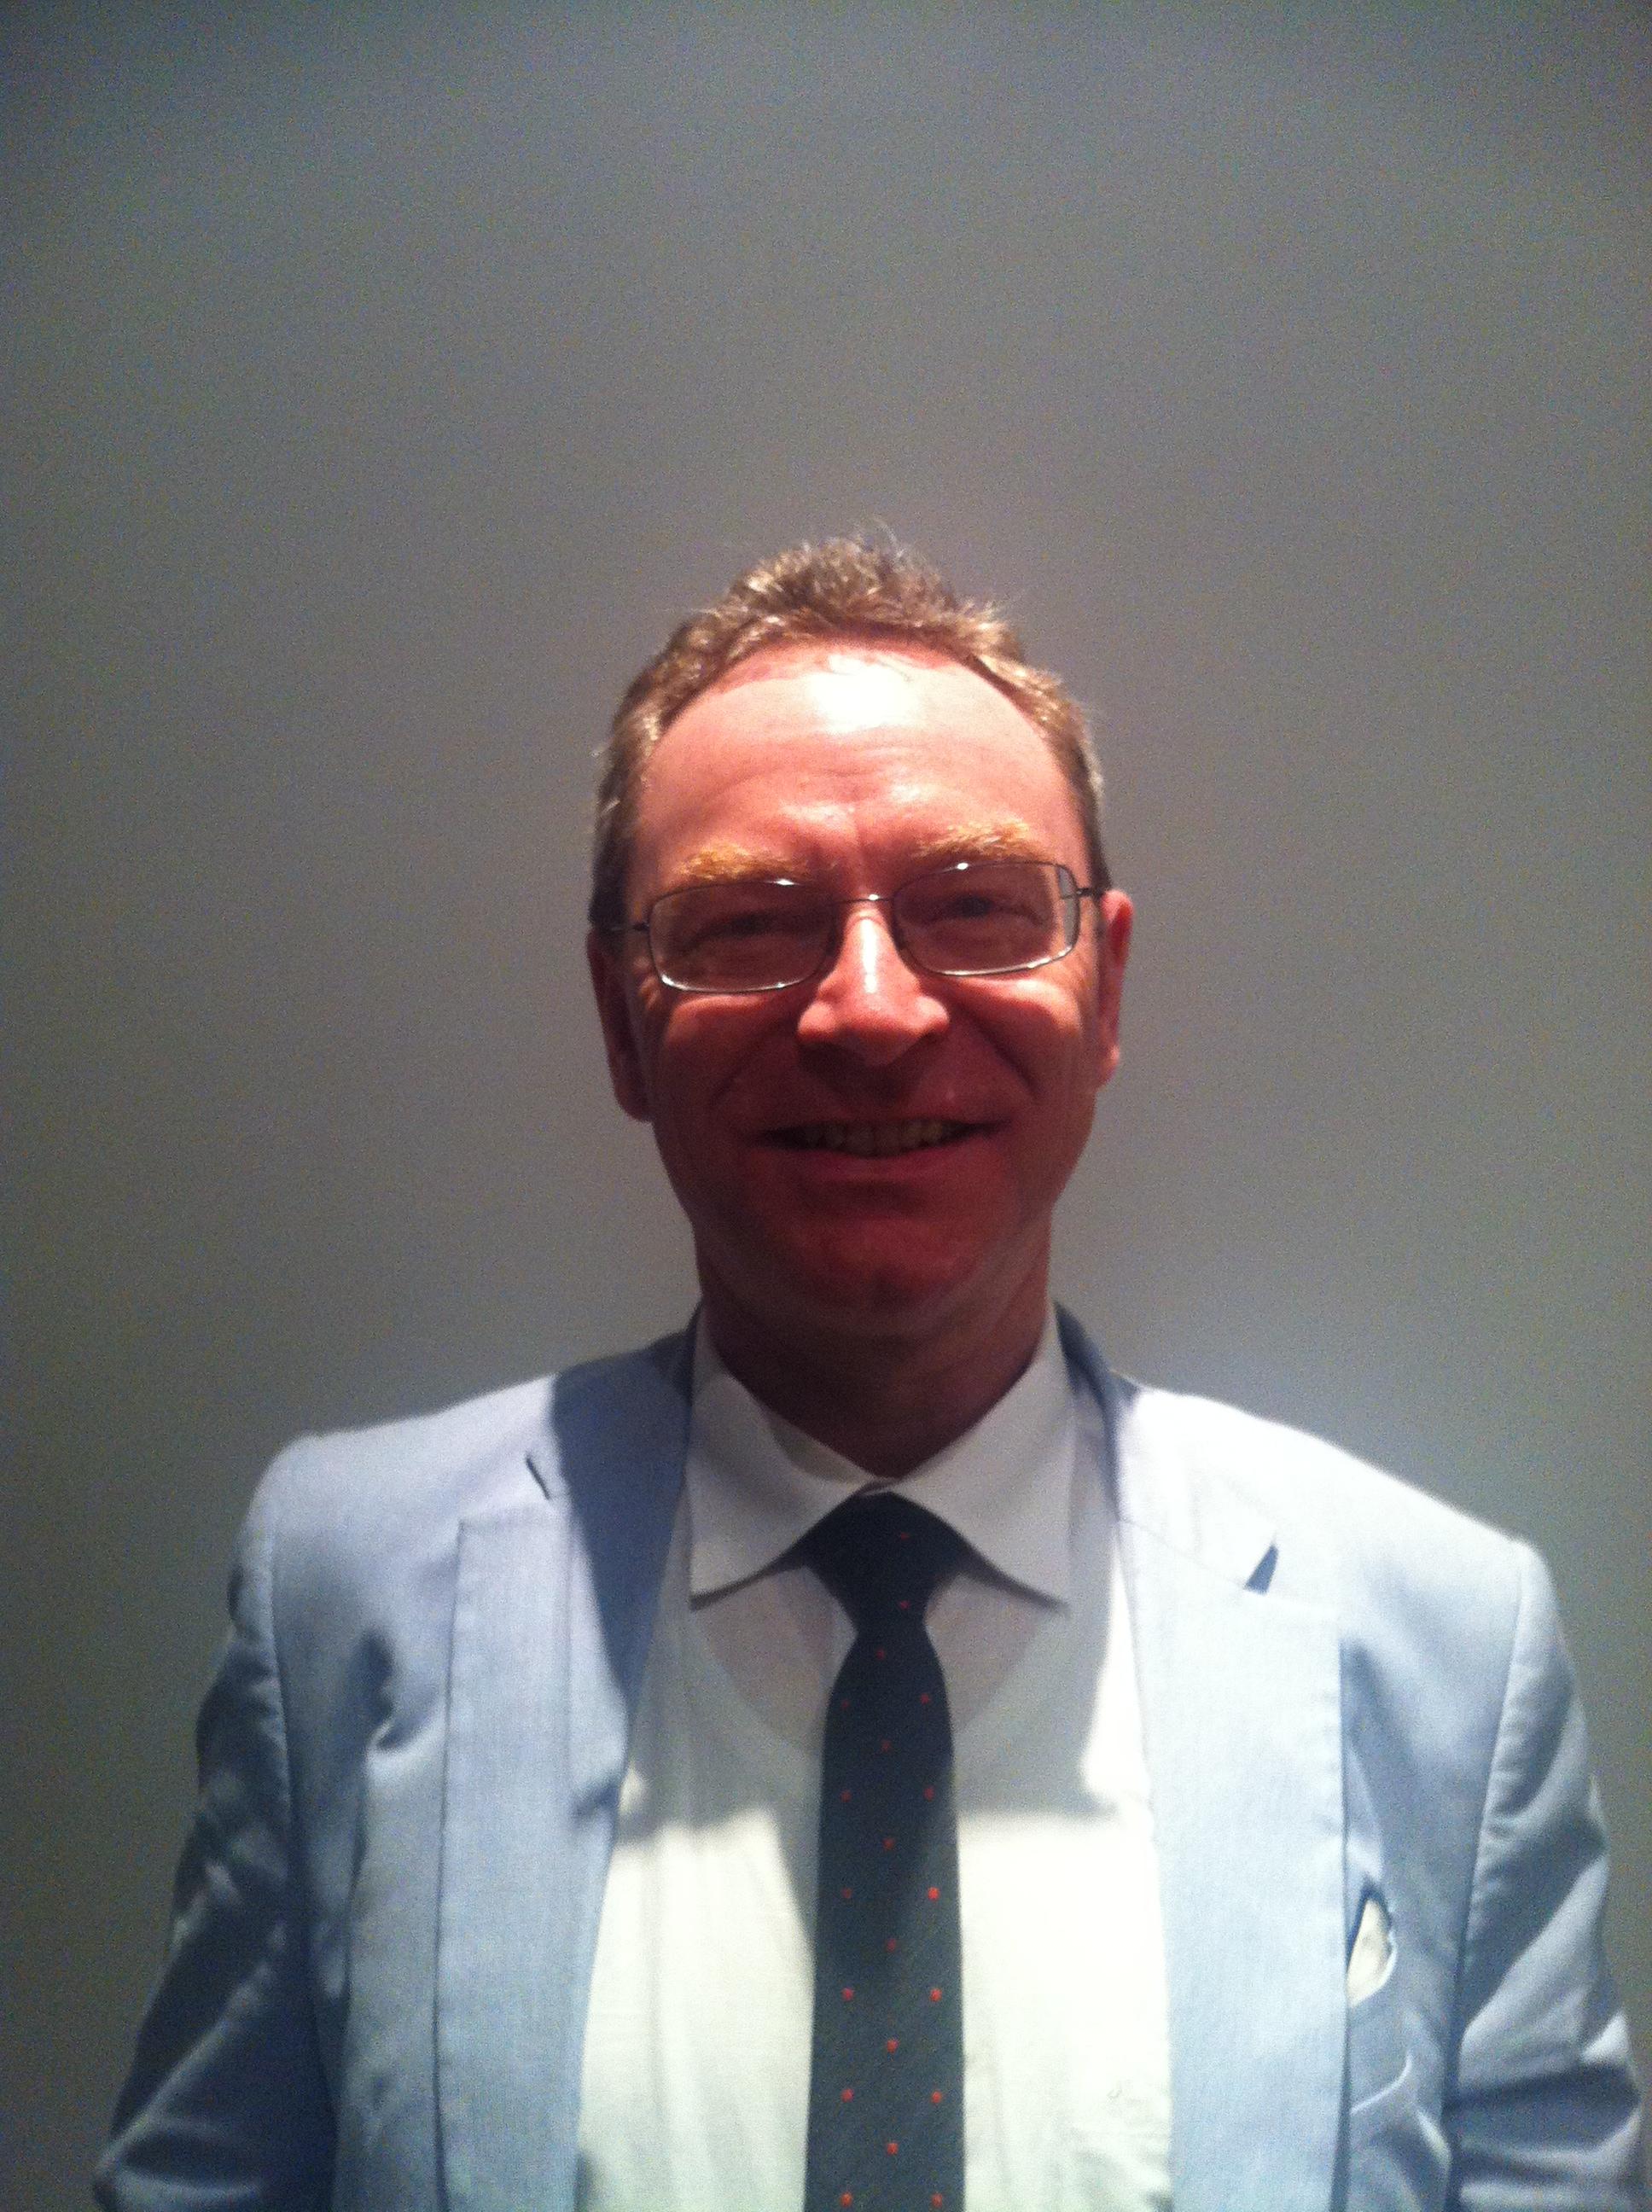 Vice President Dr. Raimund Royer